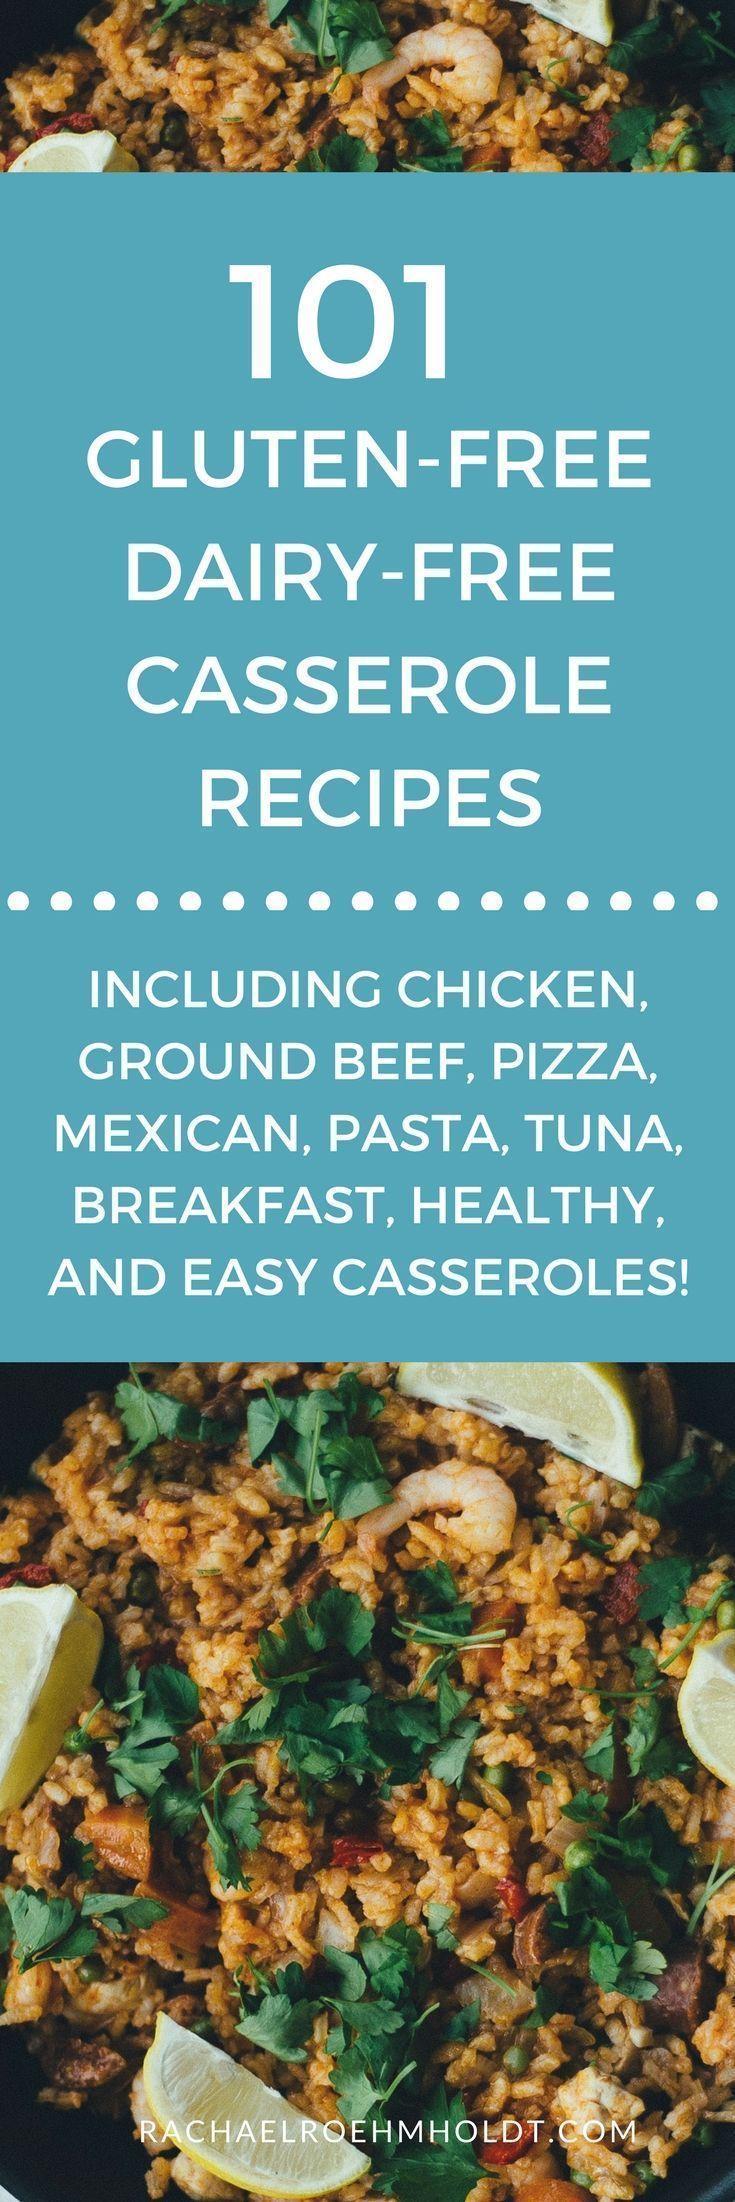 101 Gluten Free Dairy Free Casserole Recipes Free Casserole Recipes Dairy Free Breakfast Casserole Free Chicken Recipes